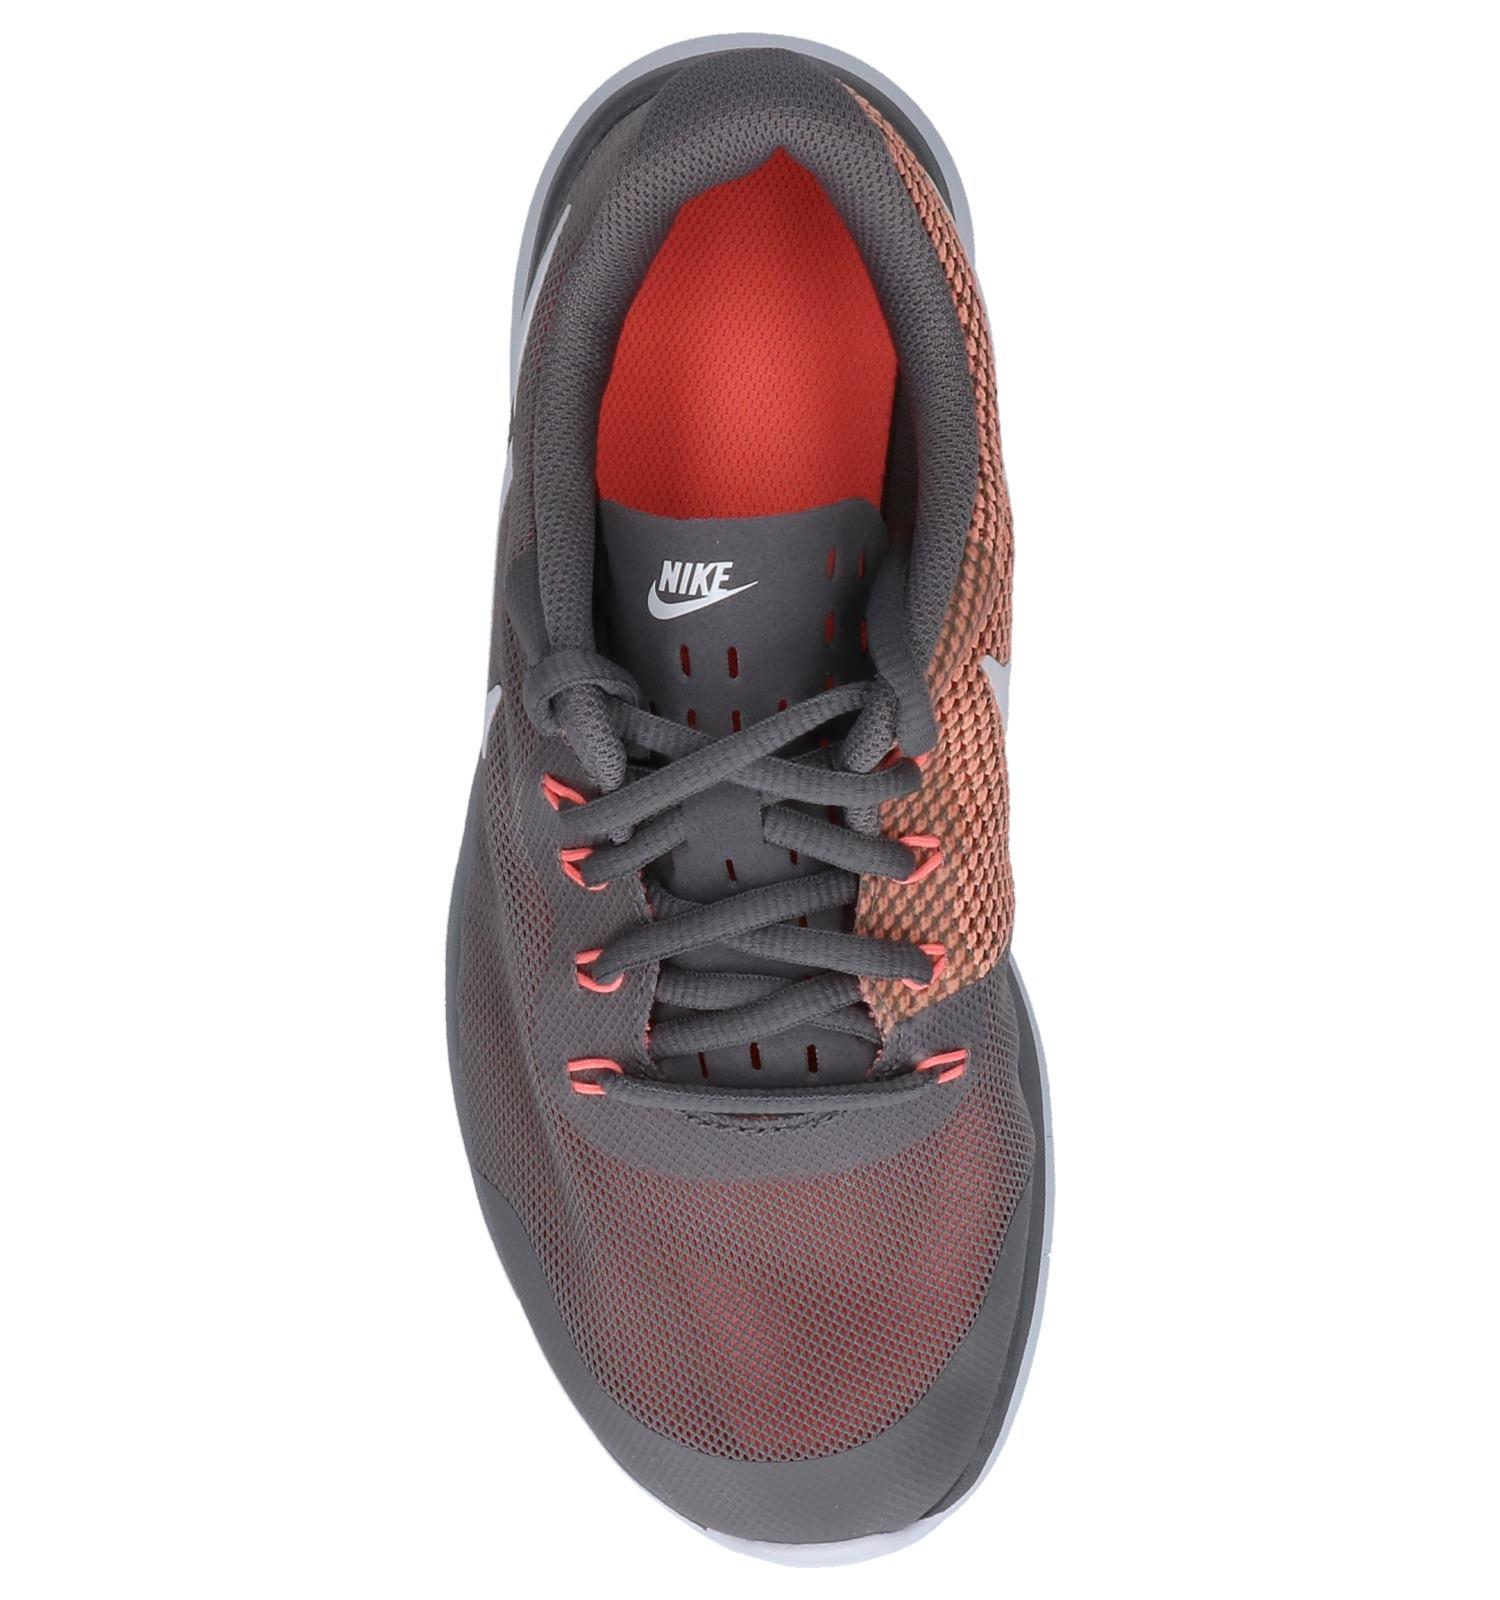 a11cf3e66a9 Nike Tanjun Racer GS Grijze Sneakers   TORFS.BE   Gratis verzend en retour